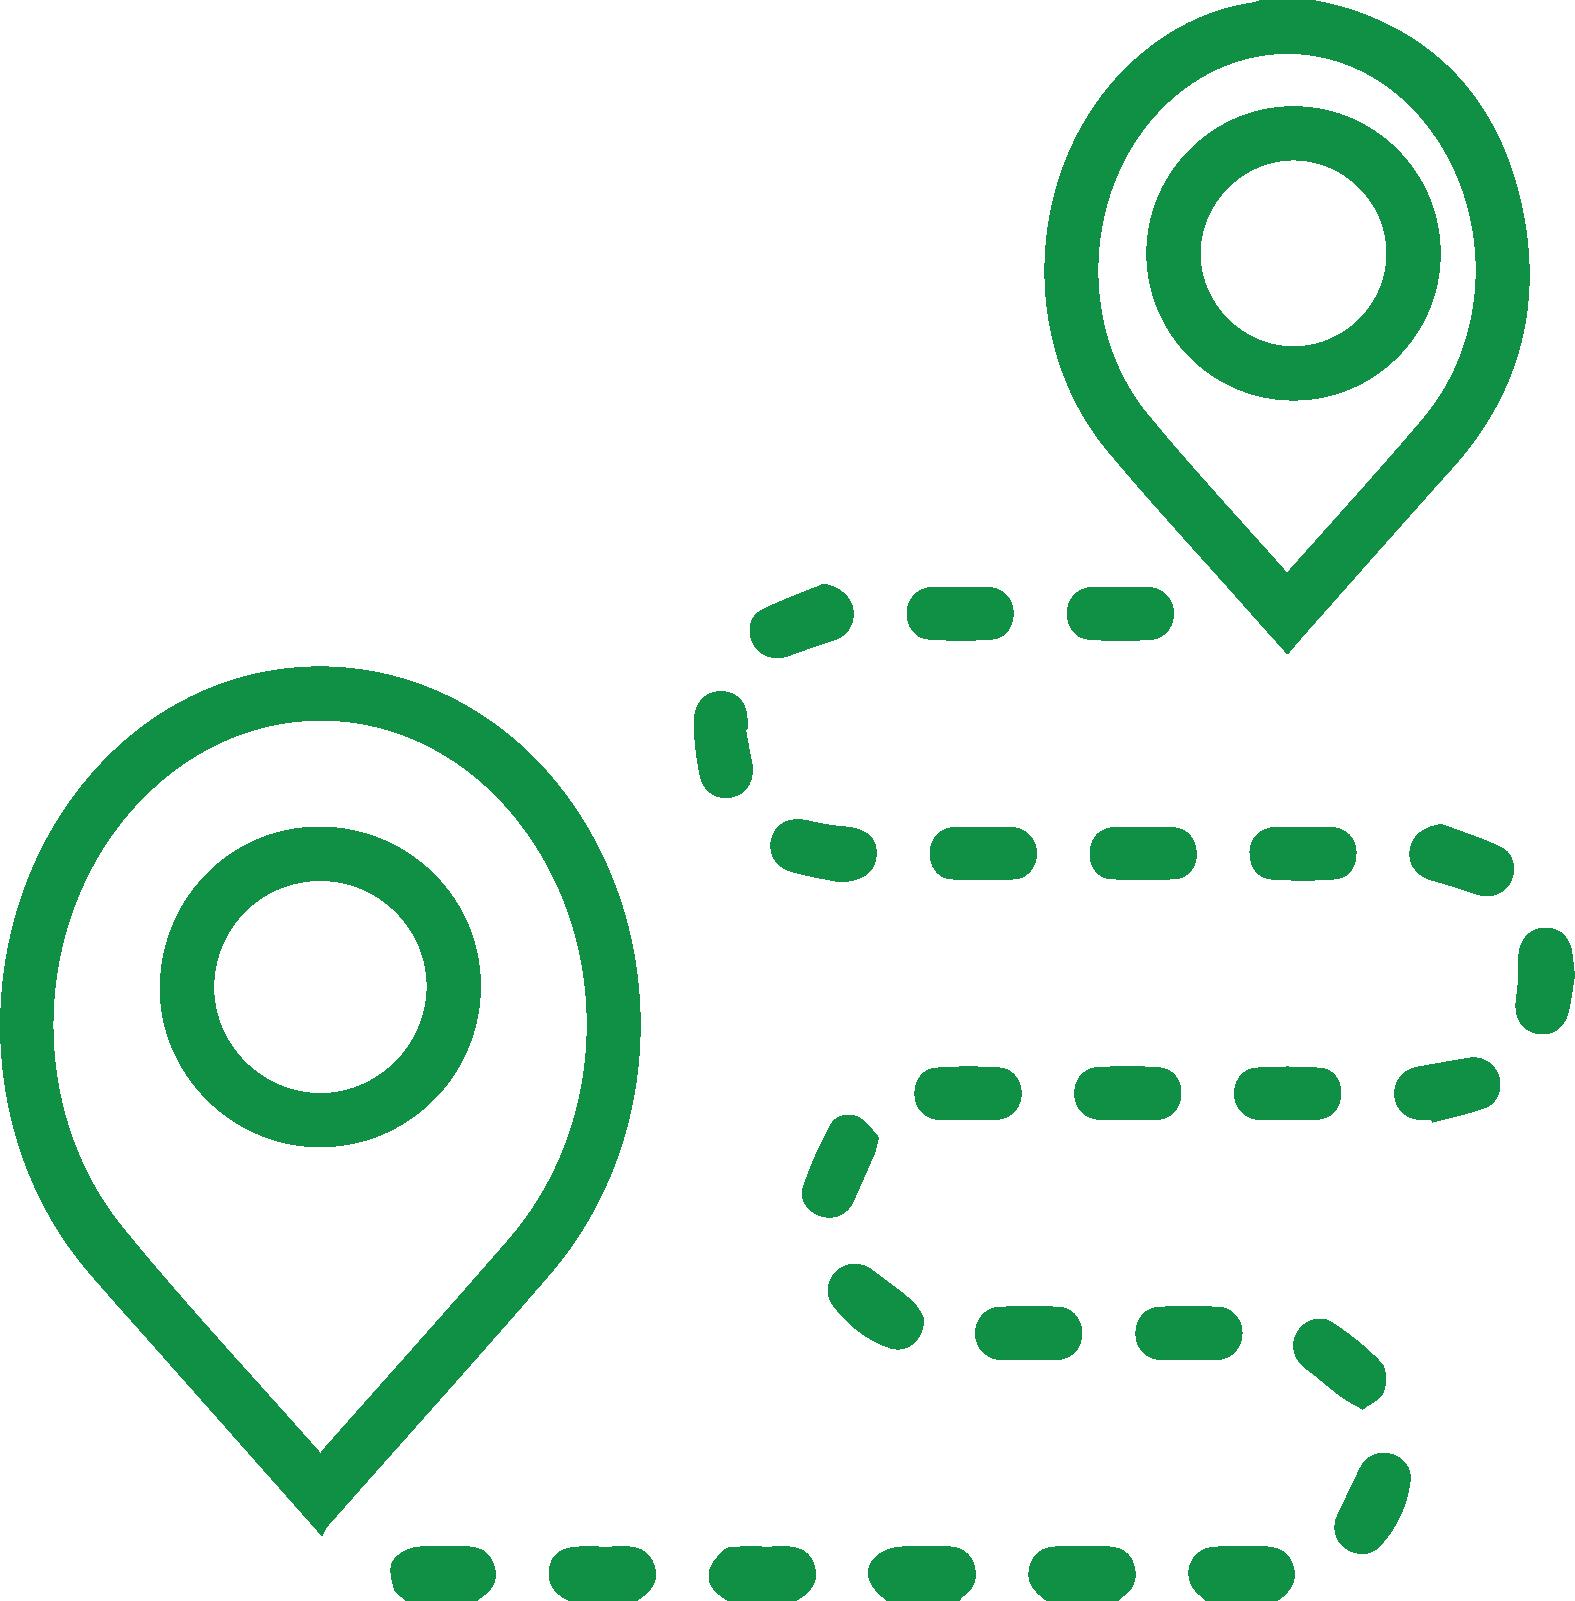 Icona: itinerario